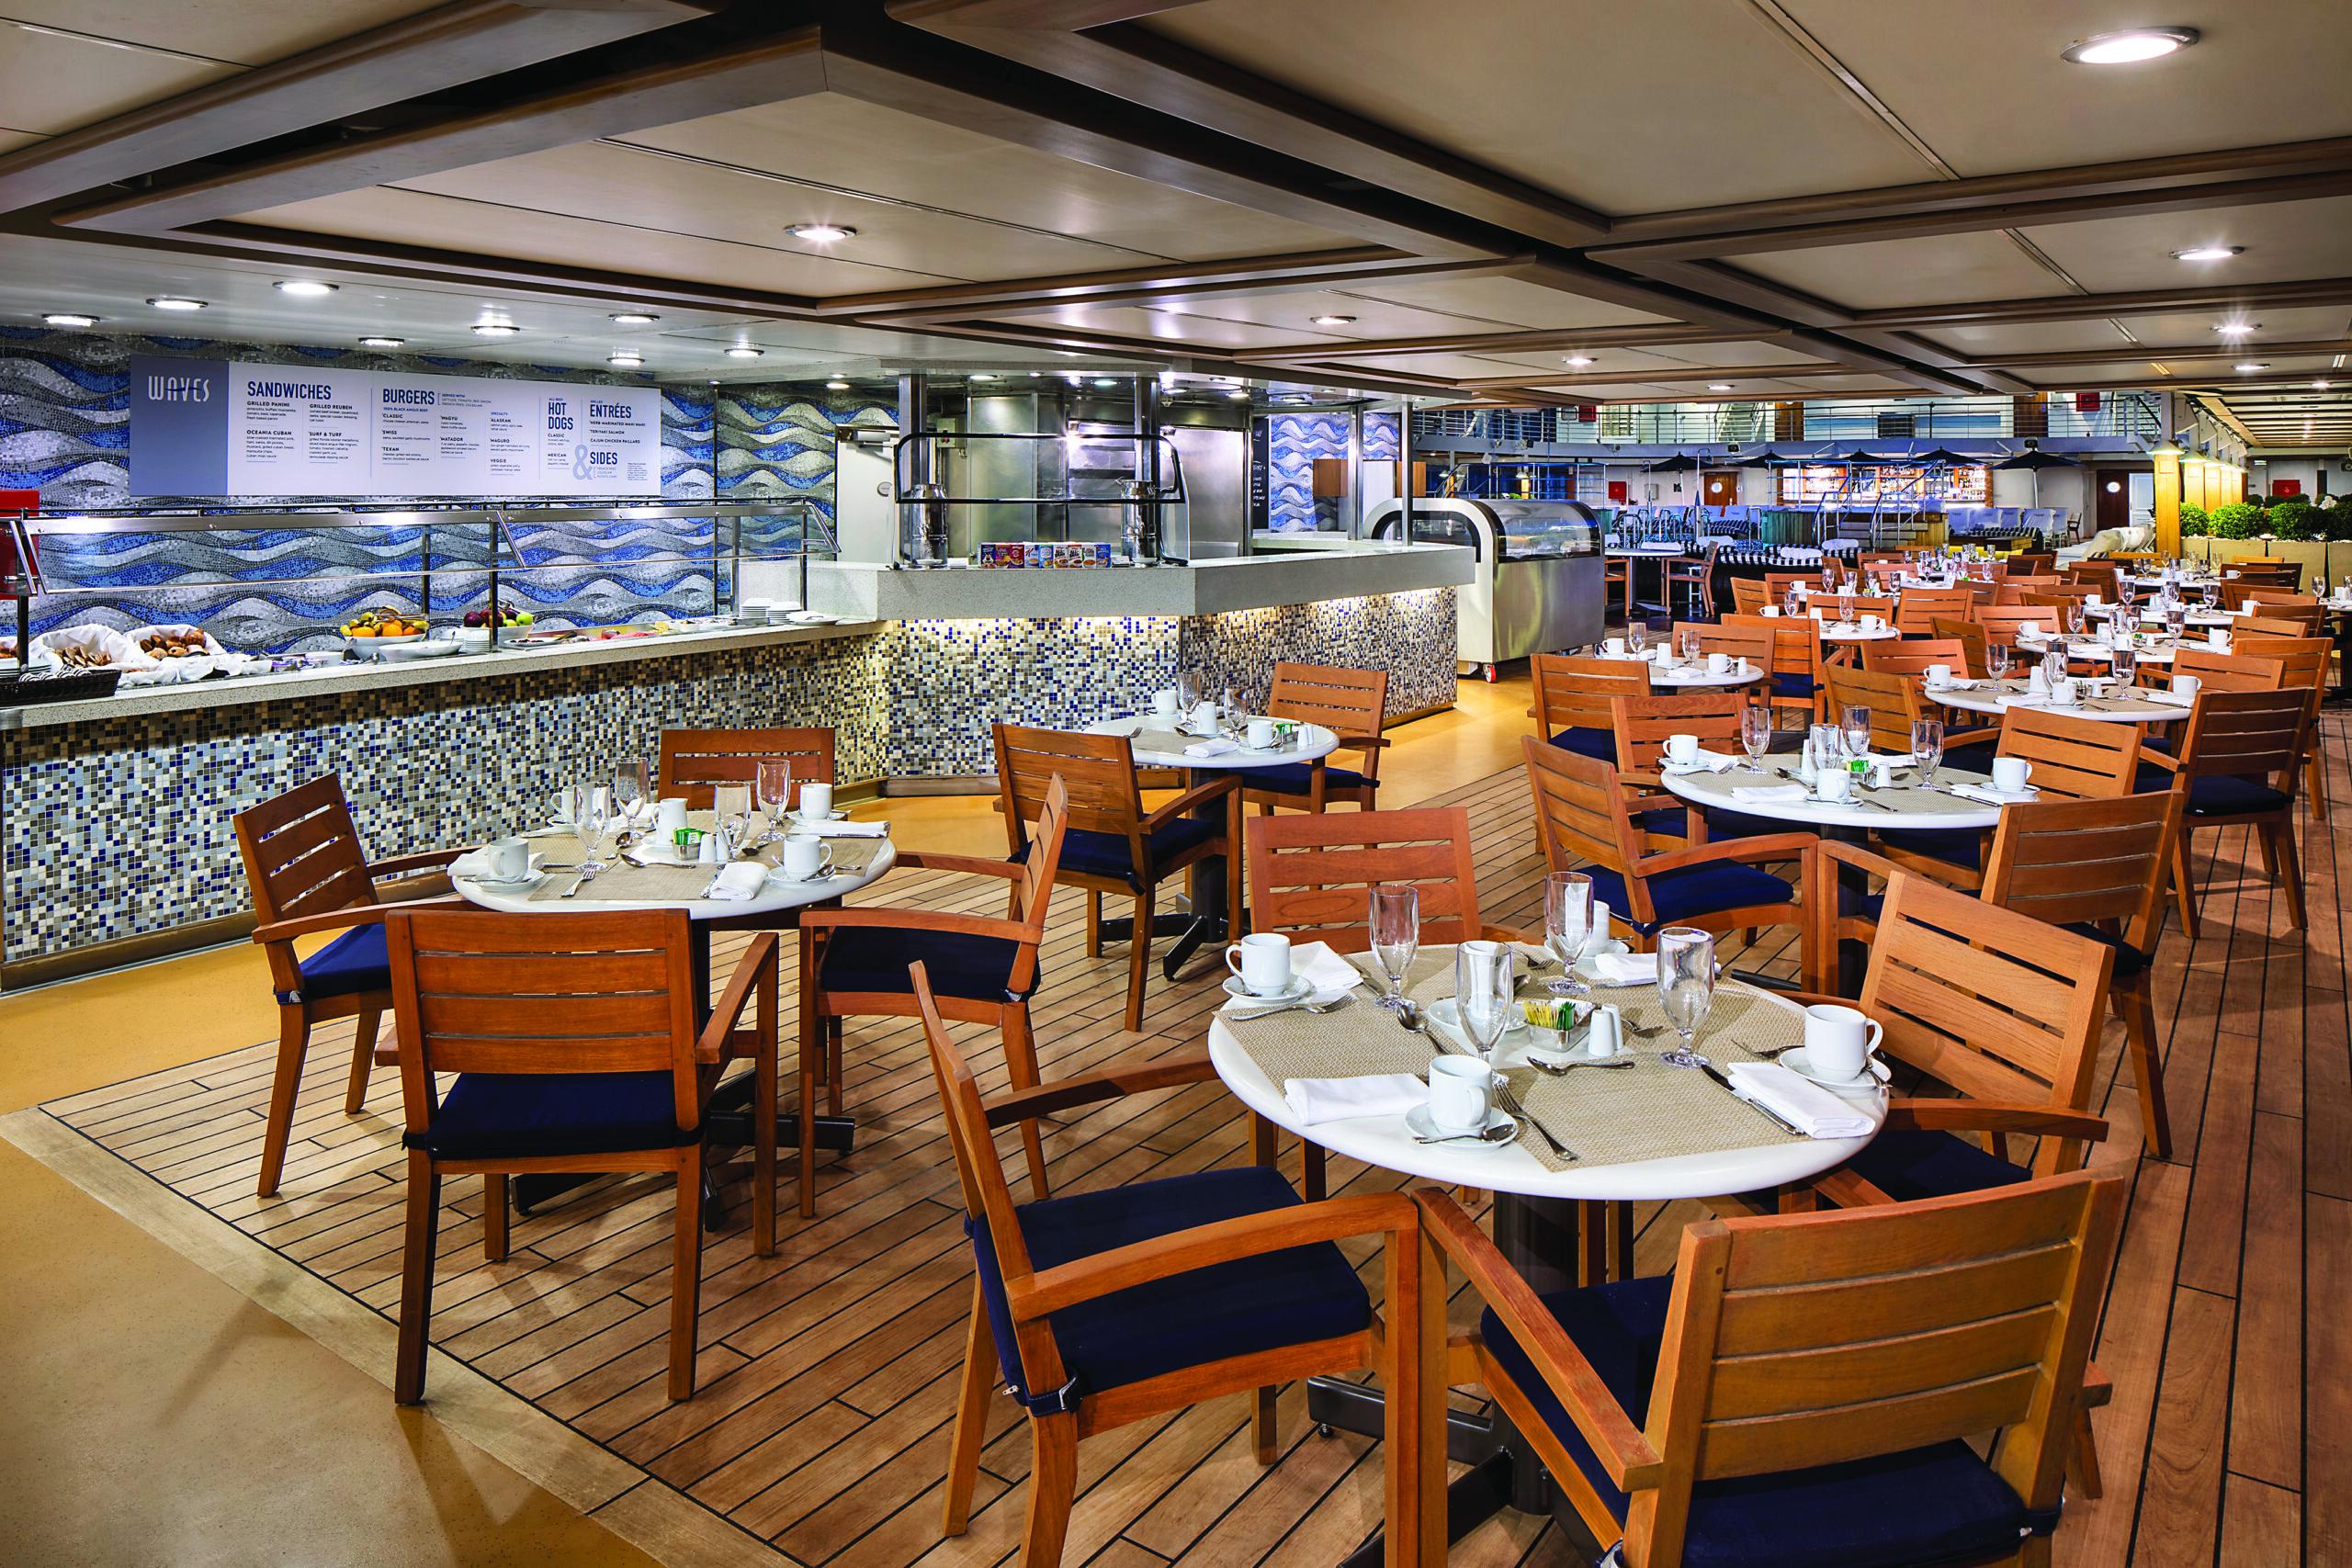 Cruiseschip-Sirena-Oceania Cruises-Restaurant Waves Grill